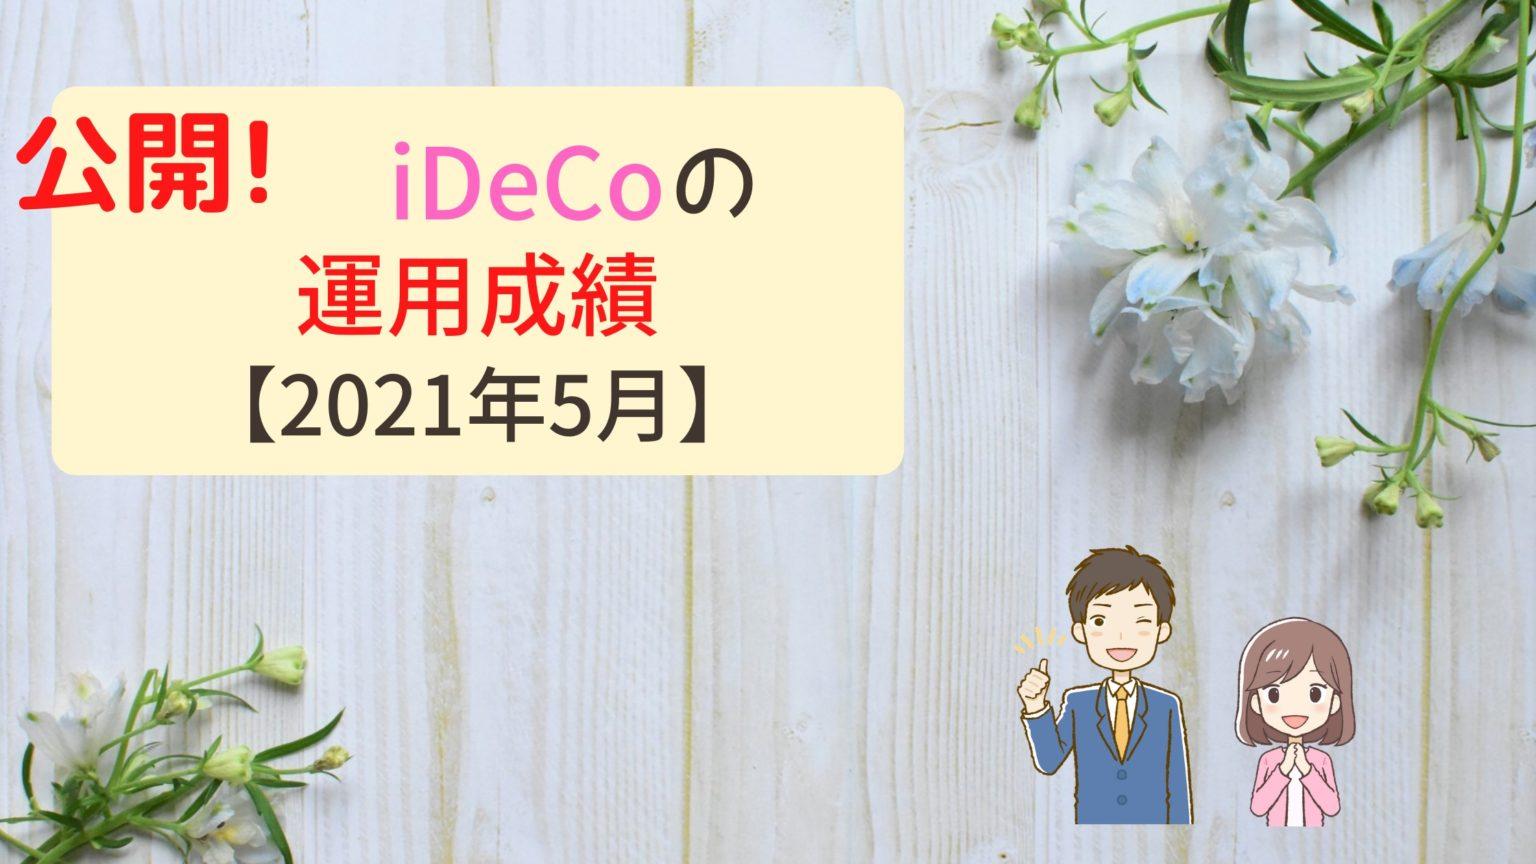 iDeCo イデコ 運用成績 2021年5月 公開